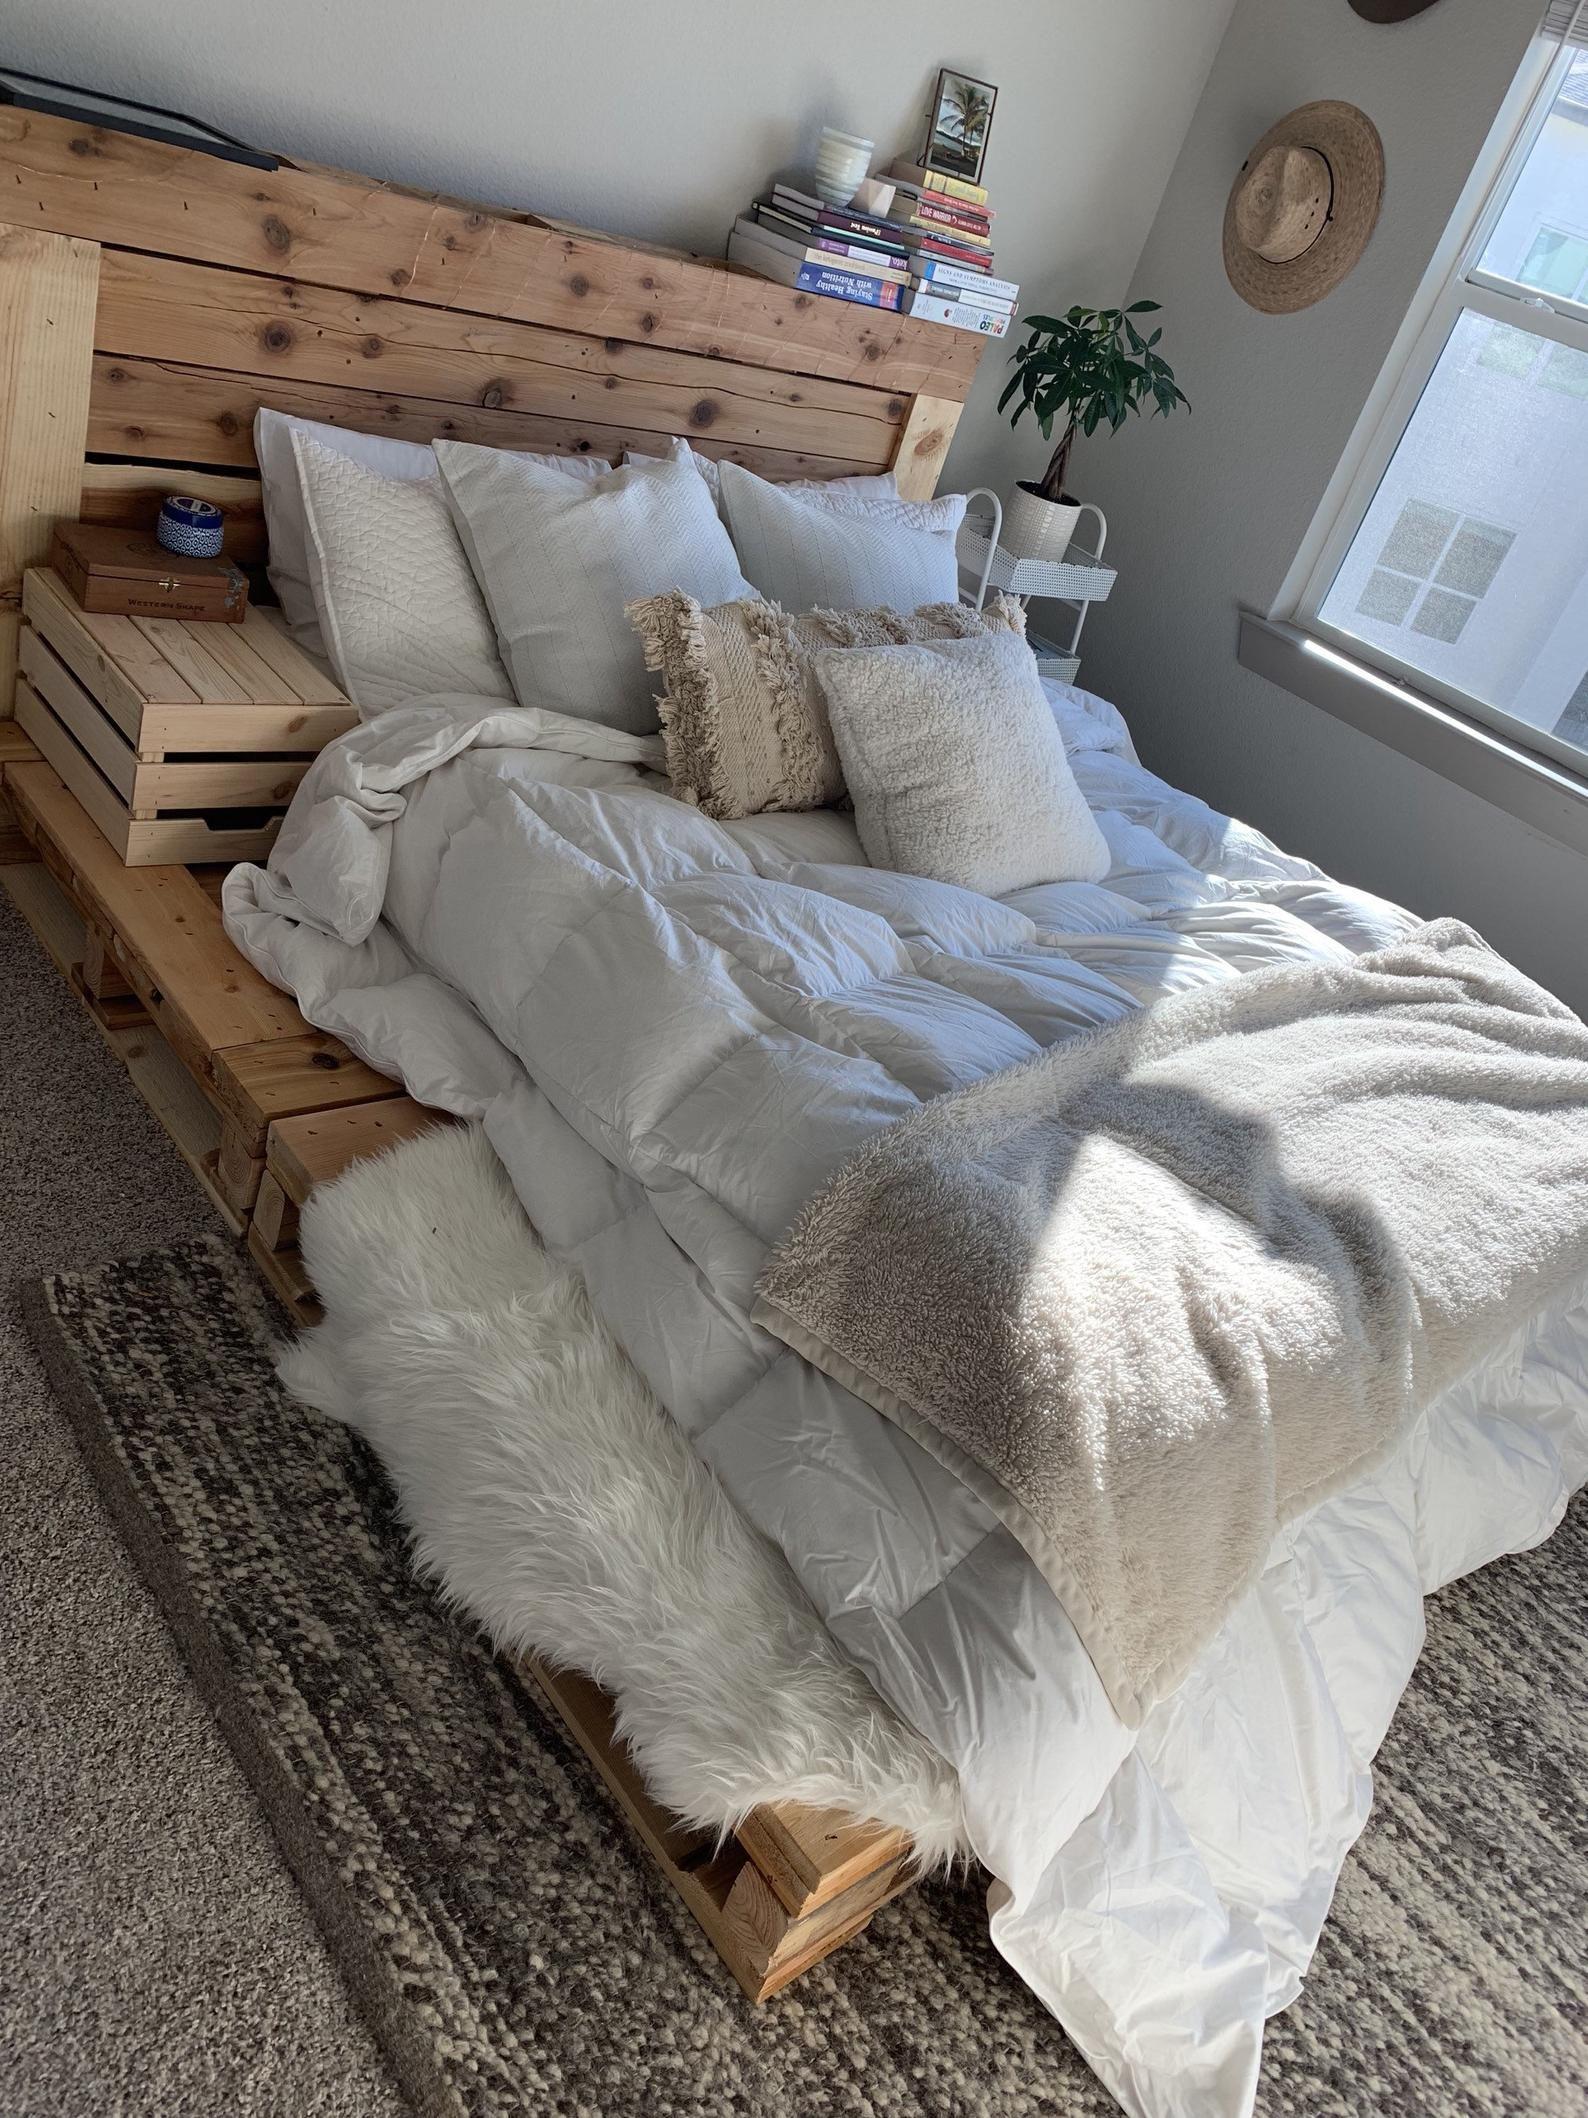 Pallet Bed The Oversized Queen Includes Headboard And Platform Pallet Platform Bed Pallet Bed Frame Bedroom Decor